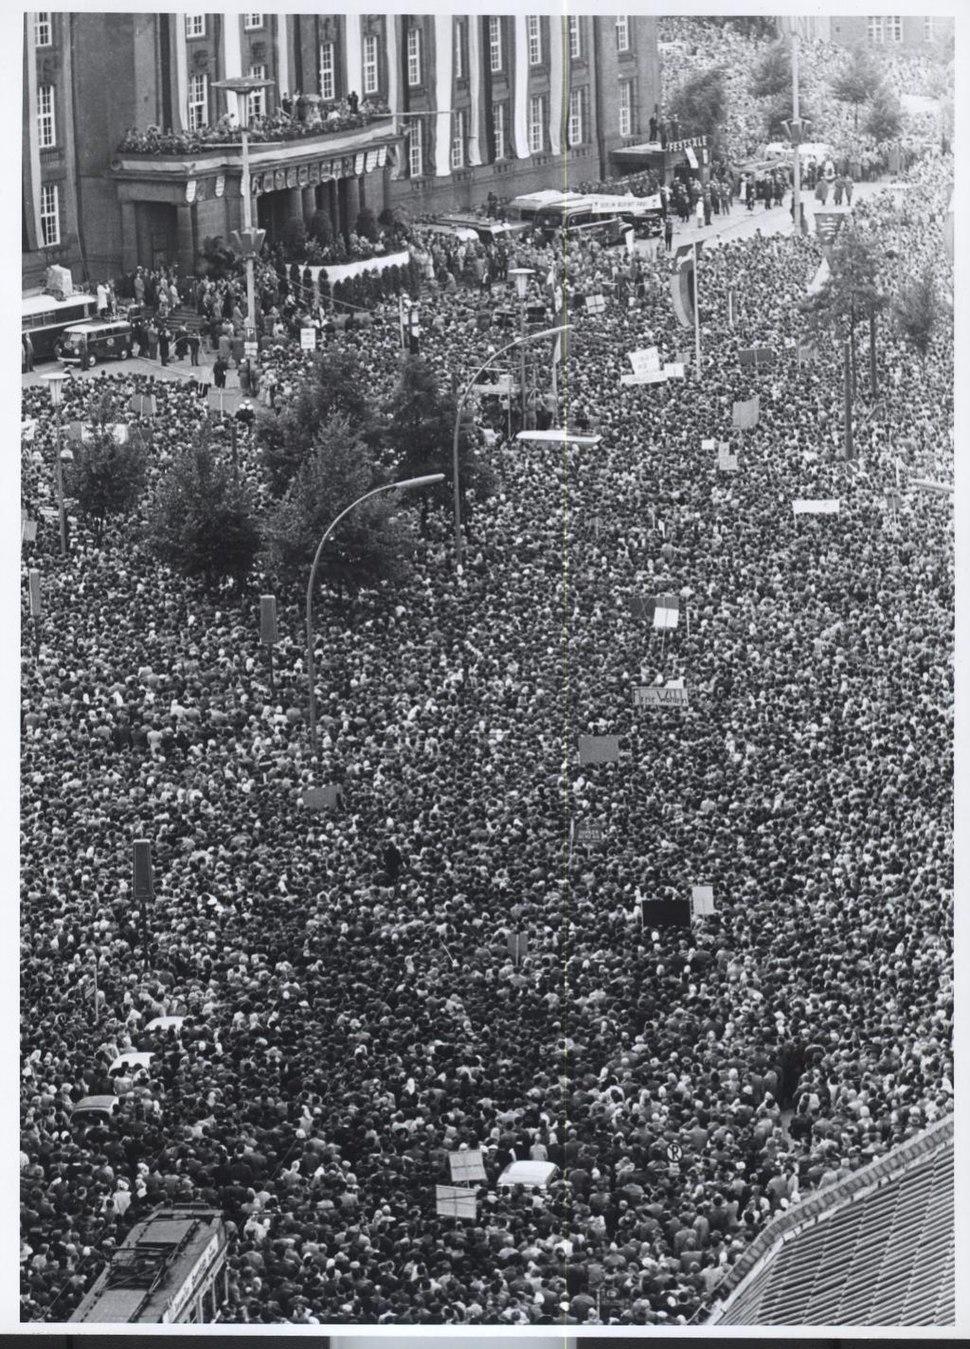 West Germans Demonstrating - Flickr - The Central Intelligence Agency